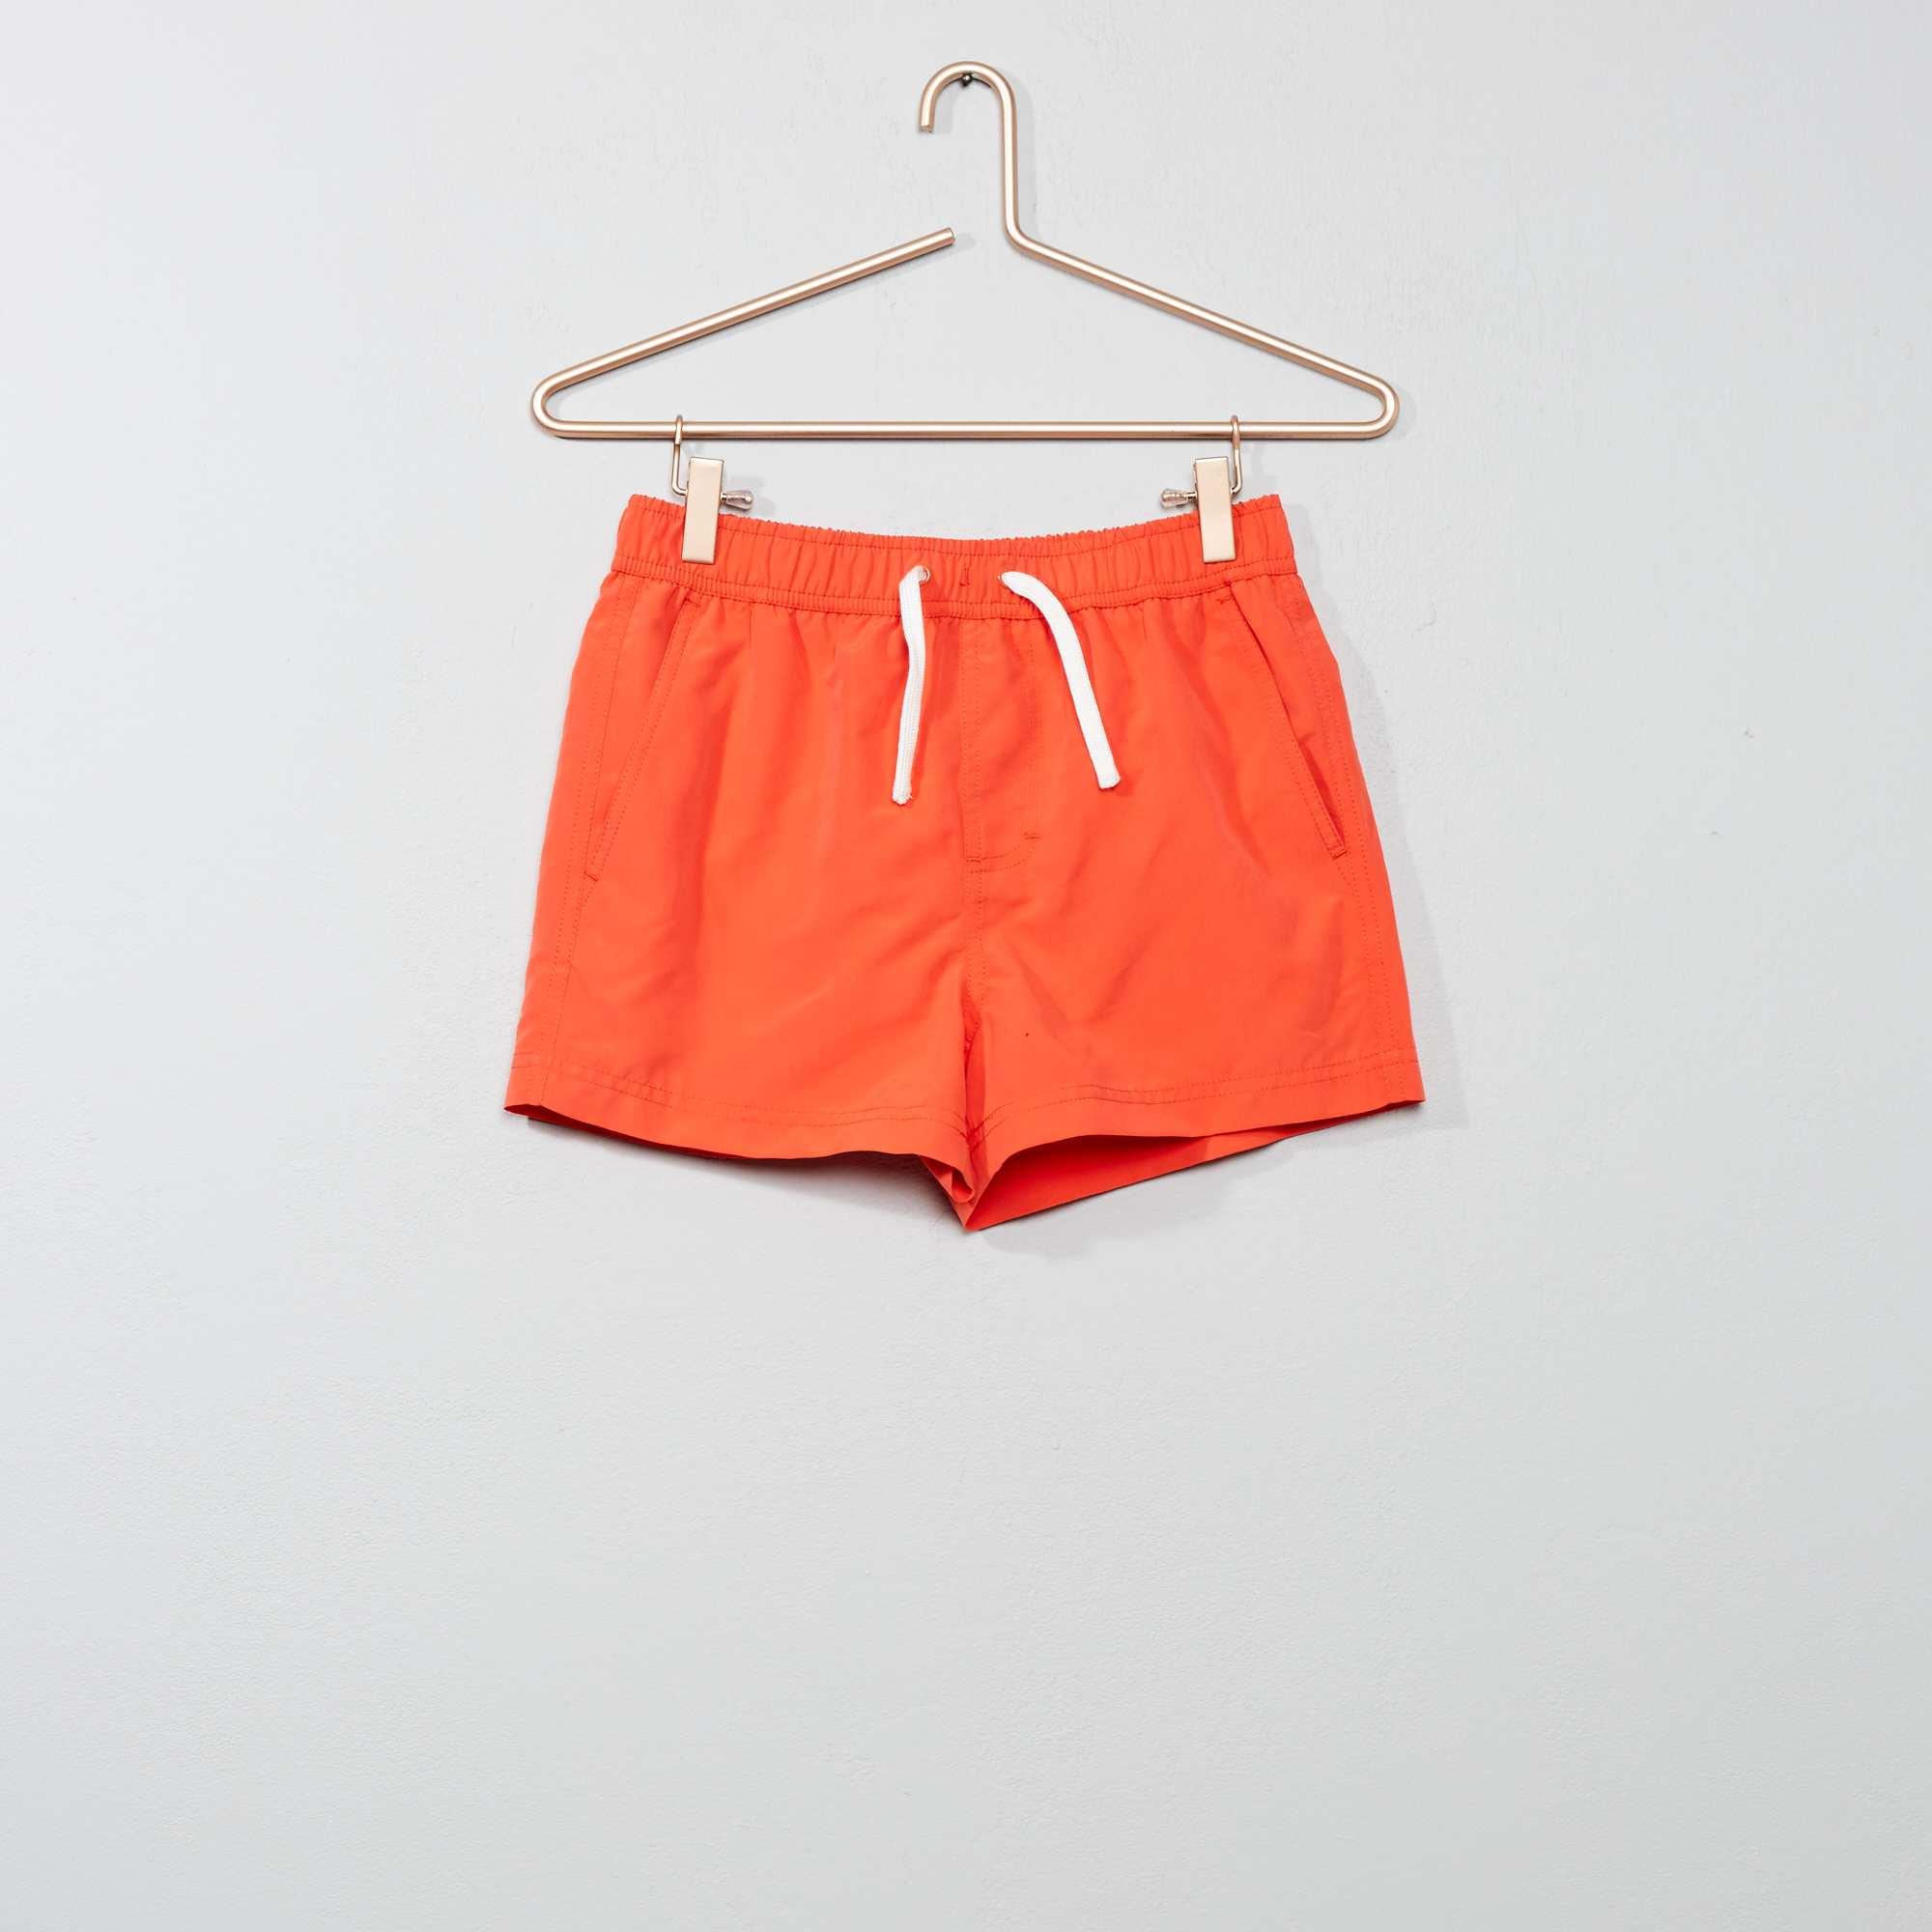 687132c7280f7 Short de bain Garçon adolescent - orange